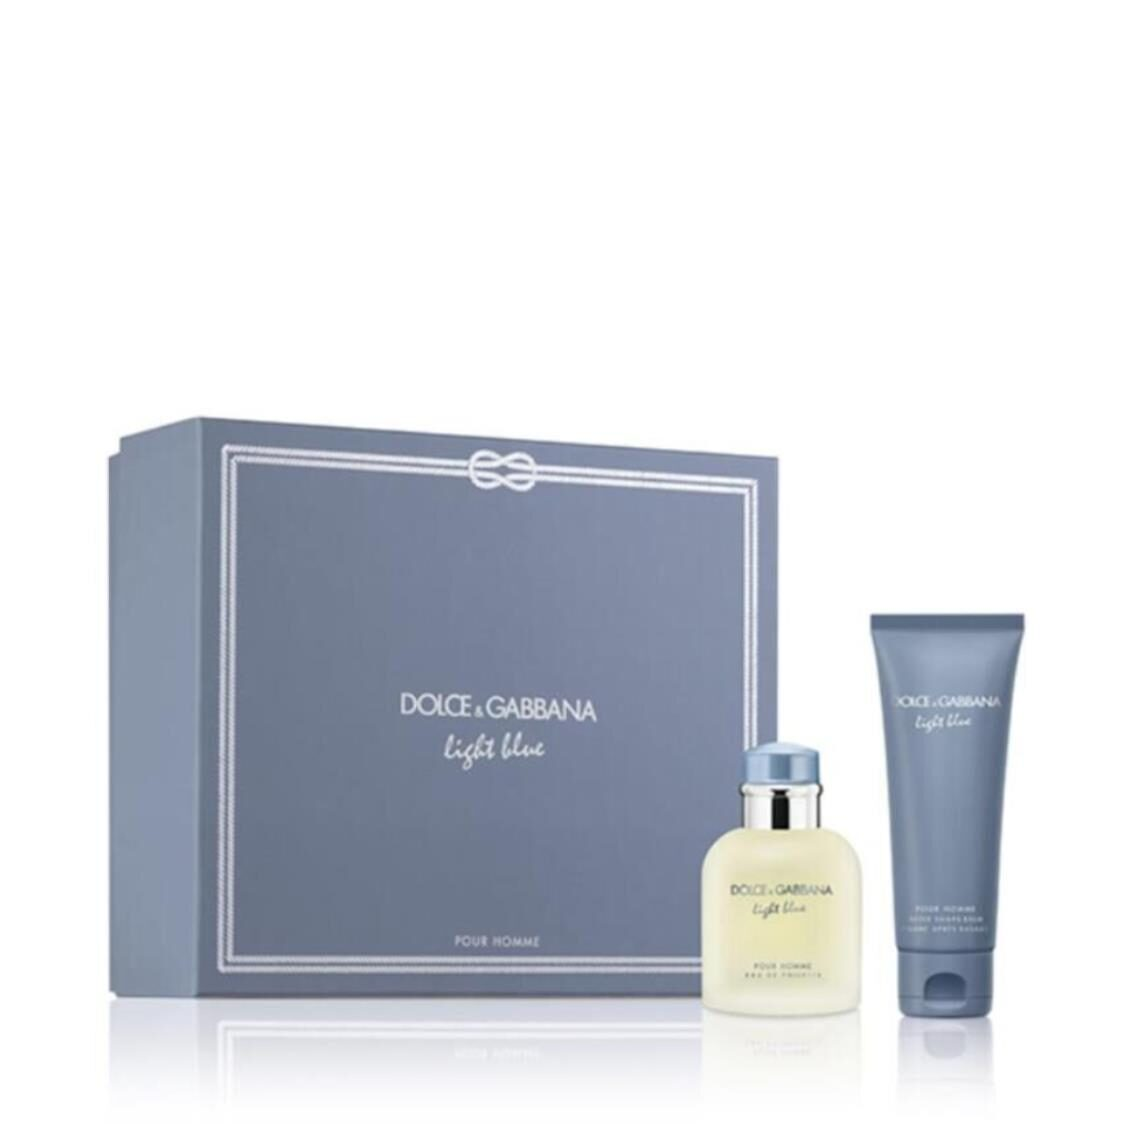 Dolce  Gabbana Light Blue Pour Homme EDT 75ml Duo Gift Set